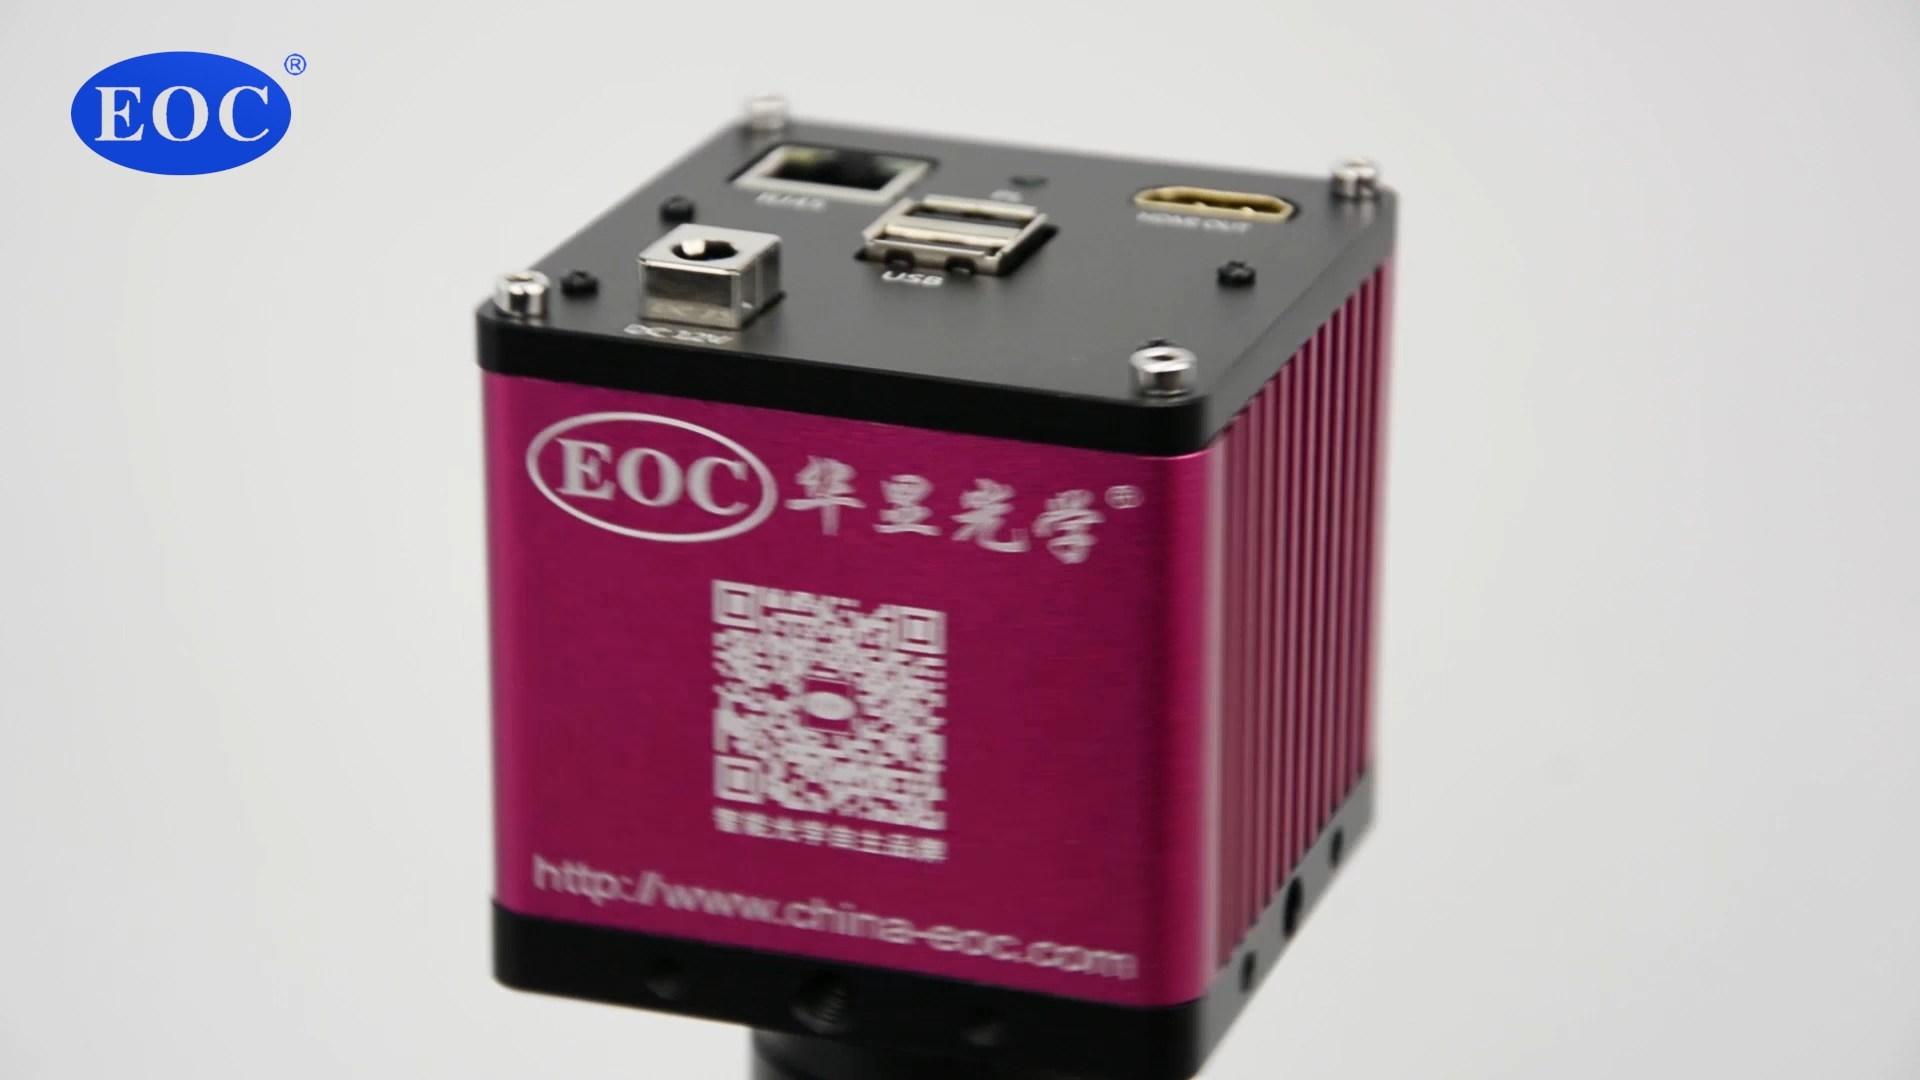 EOC 5MP صناعة كاميرا CCD وظيفة قياس HDMI متوافق والكمبيوتر ربط شاشة مراقبة الإلكترونية الرقمية مجهر الفيديو